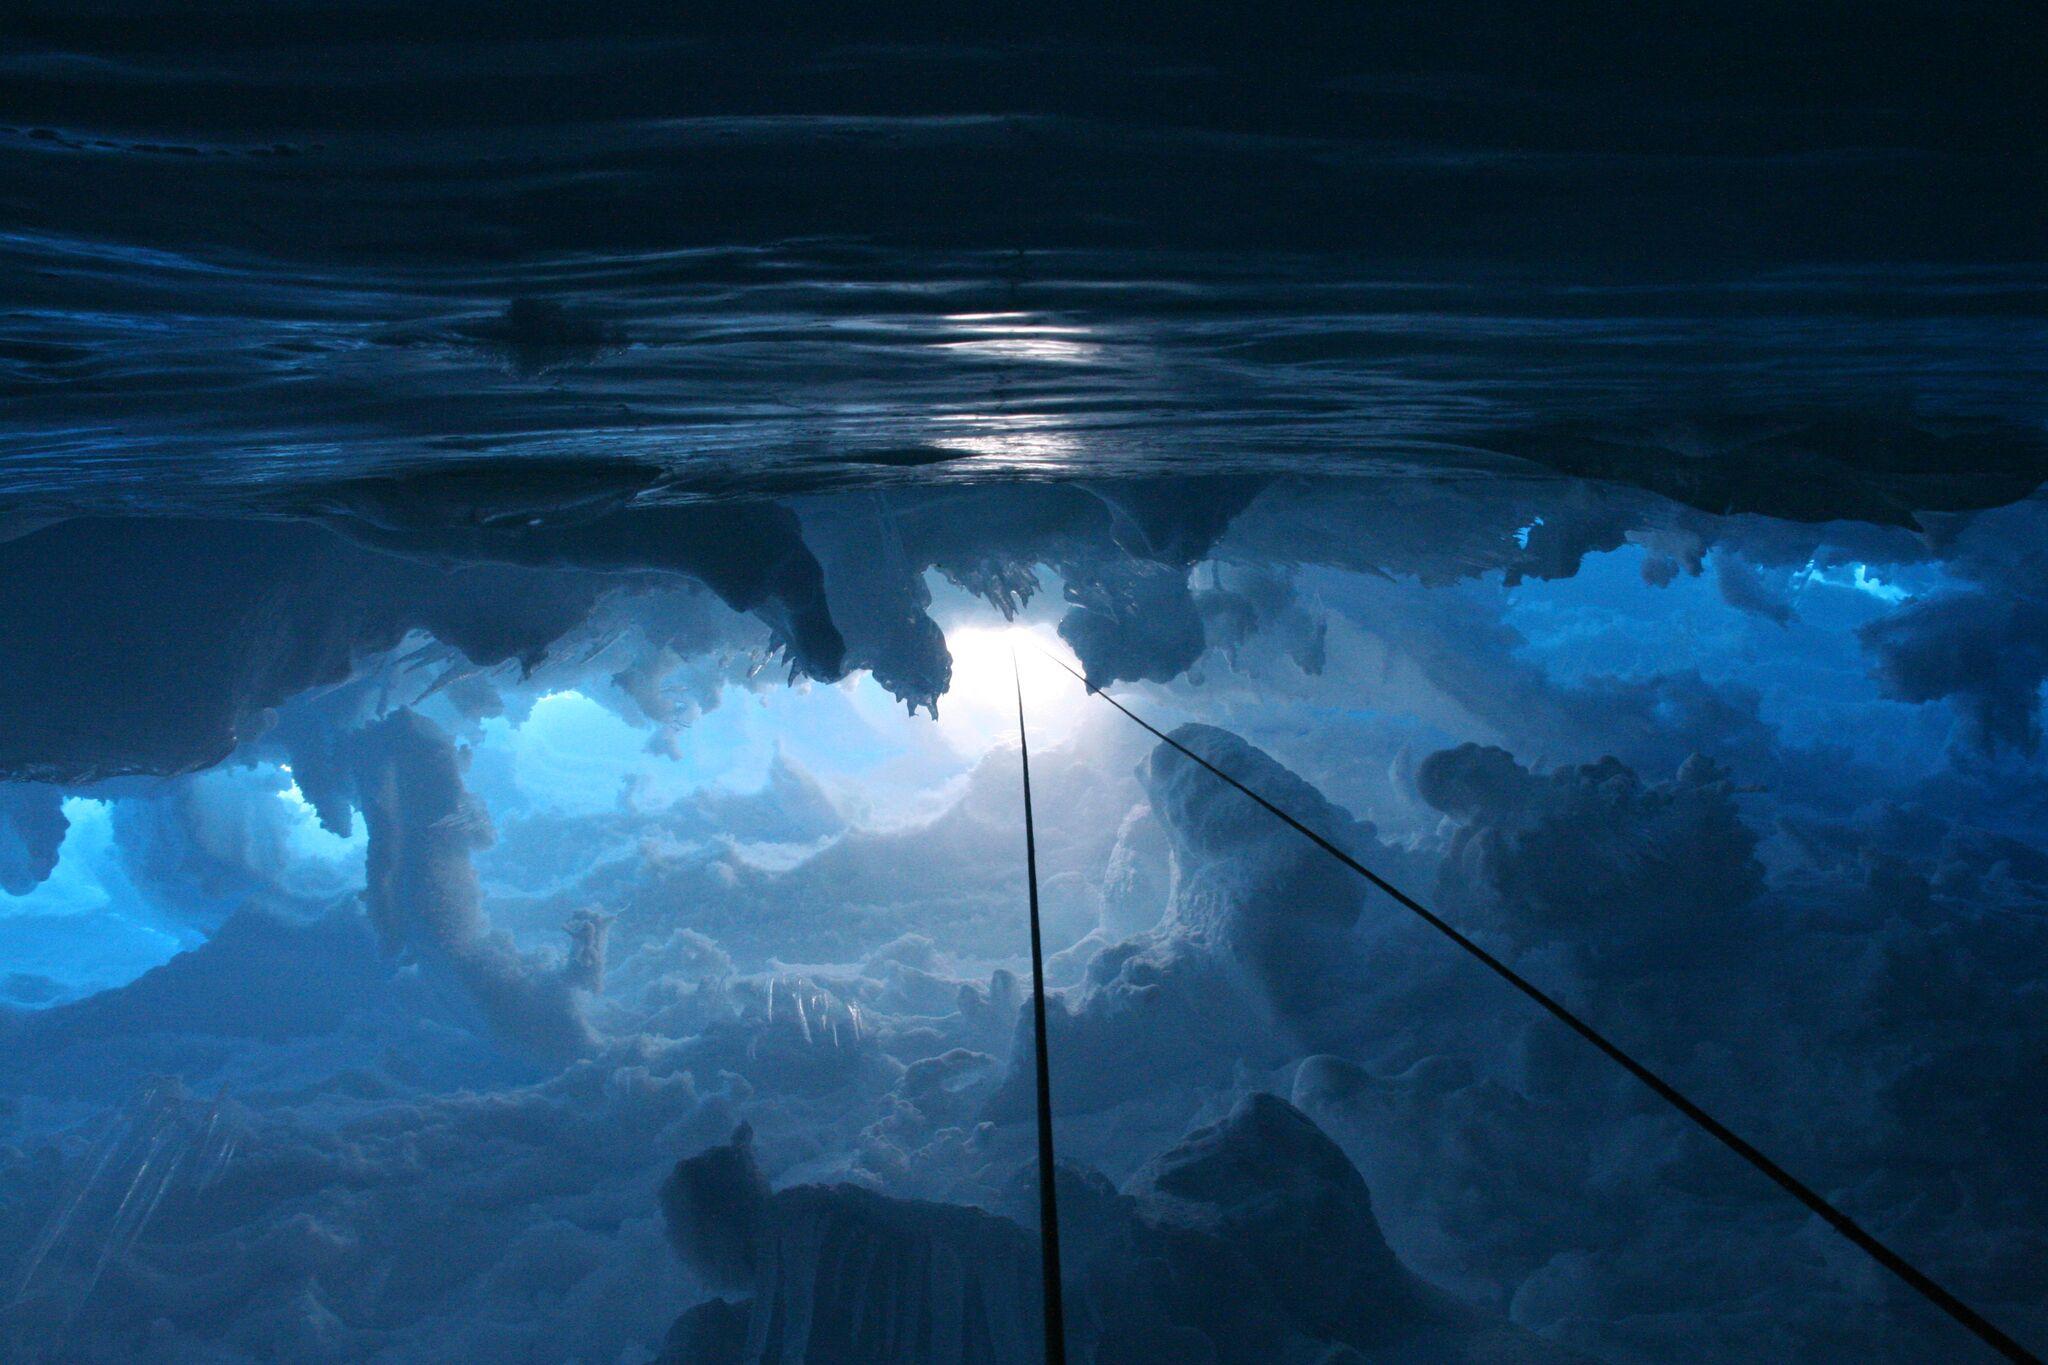 Polar Wandering, 2006 by Layla Curtis